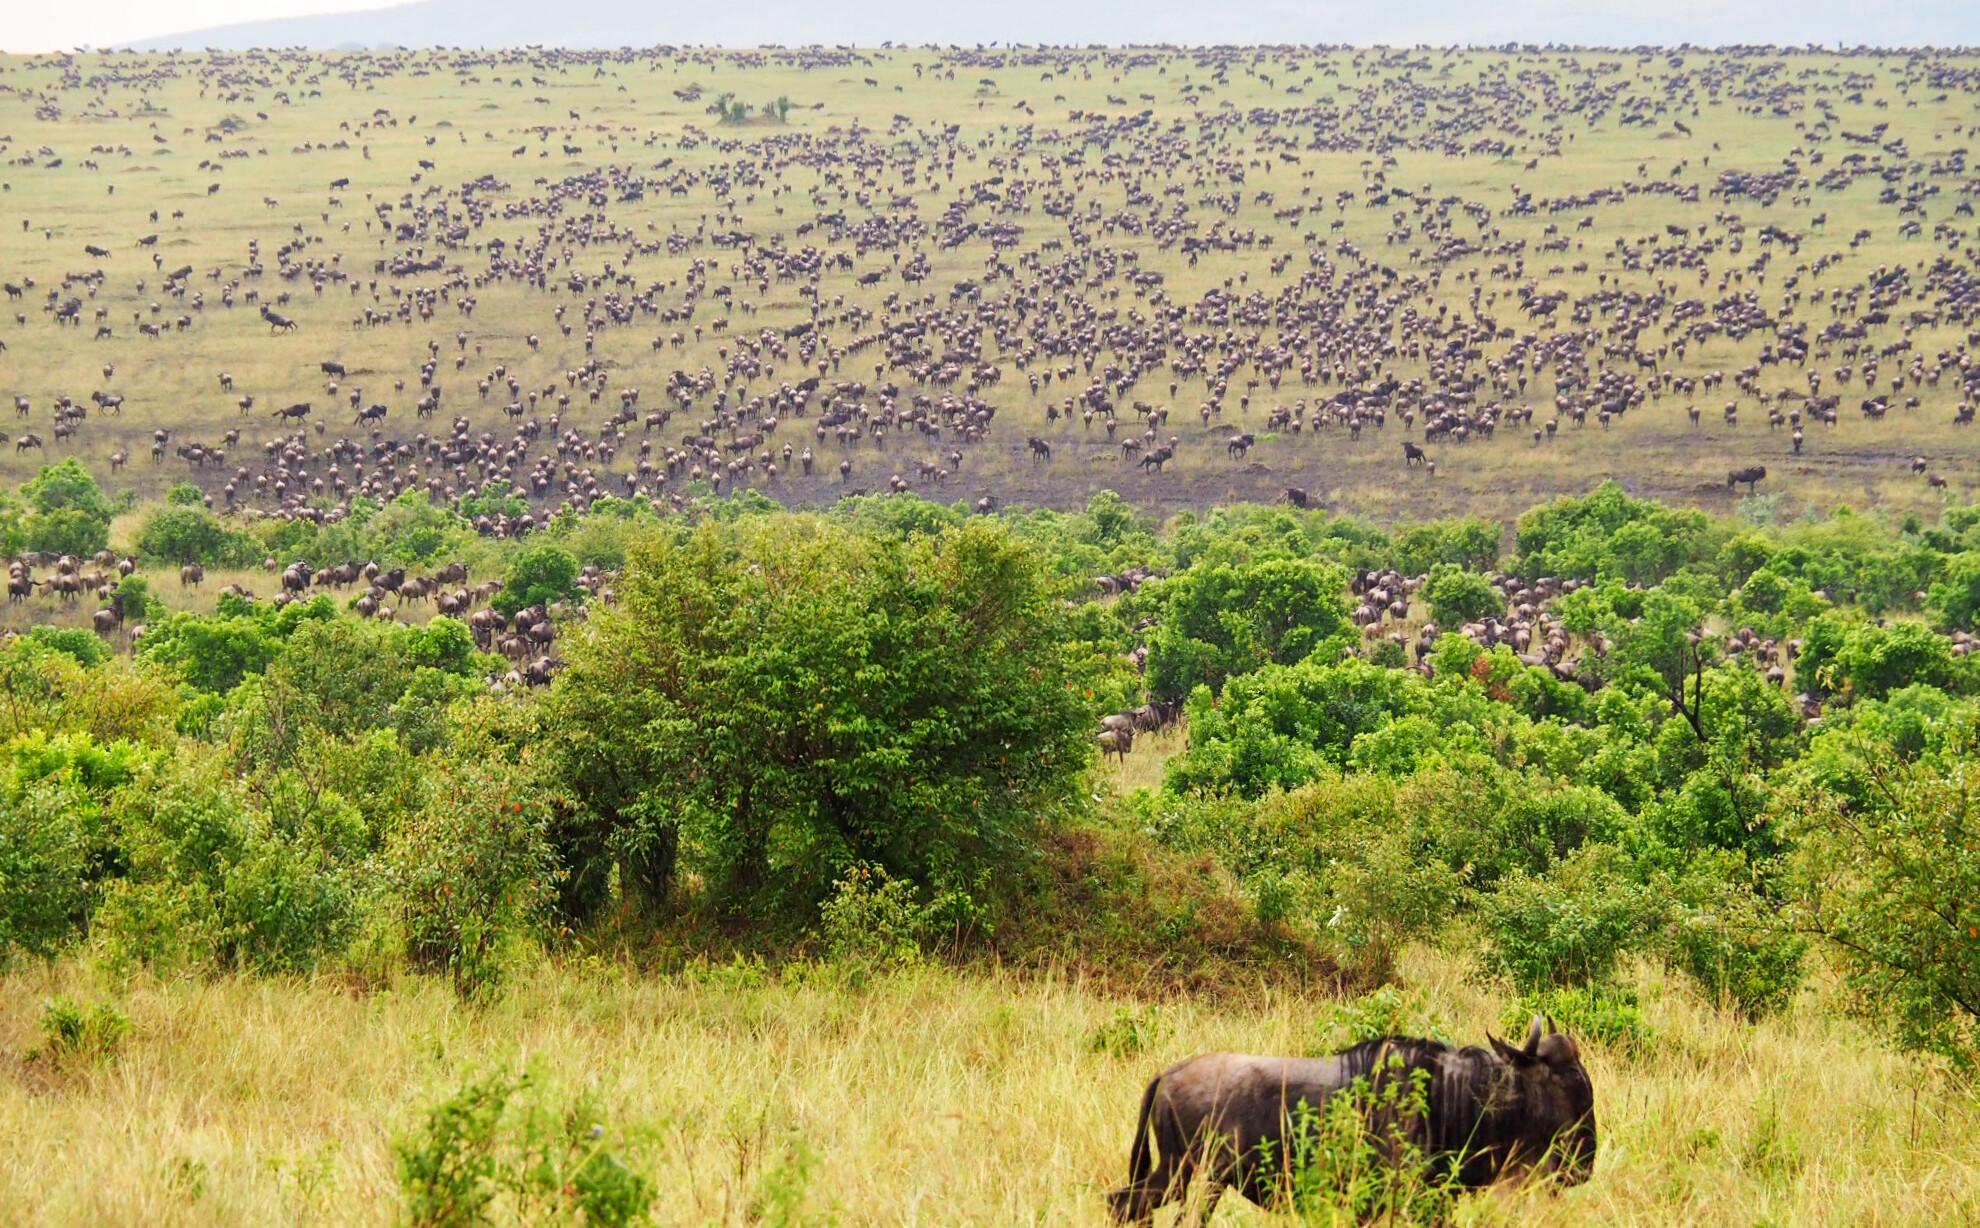 Reisebericht Kenia - Sonnenuntergang im Masai Mara Reservat